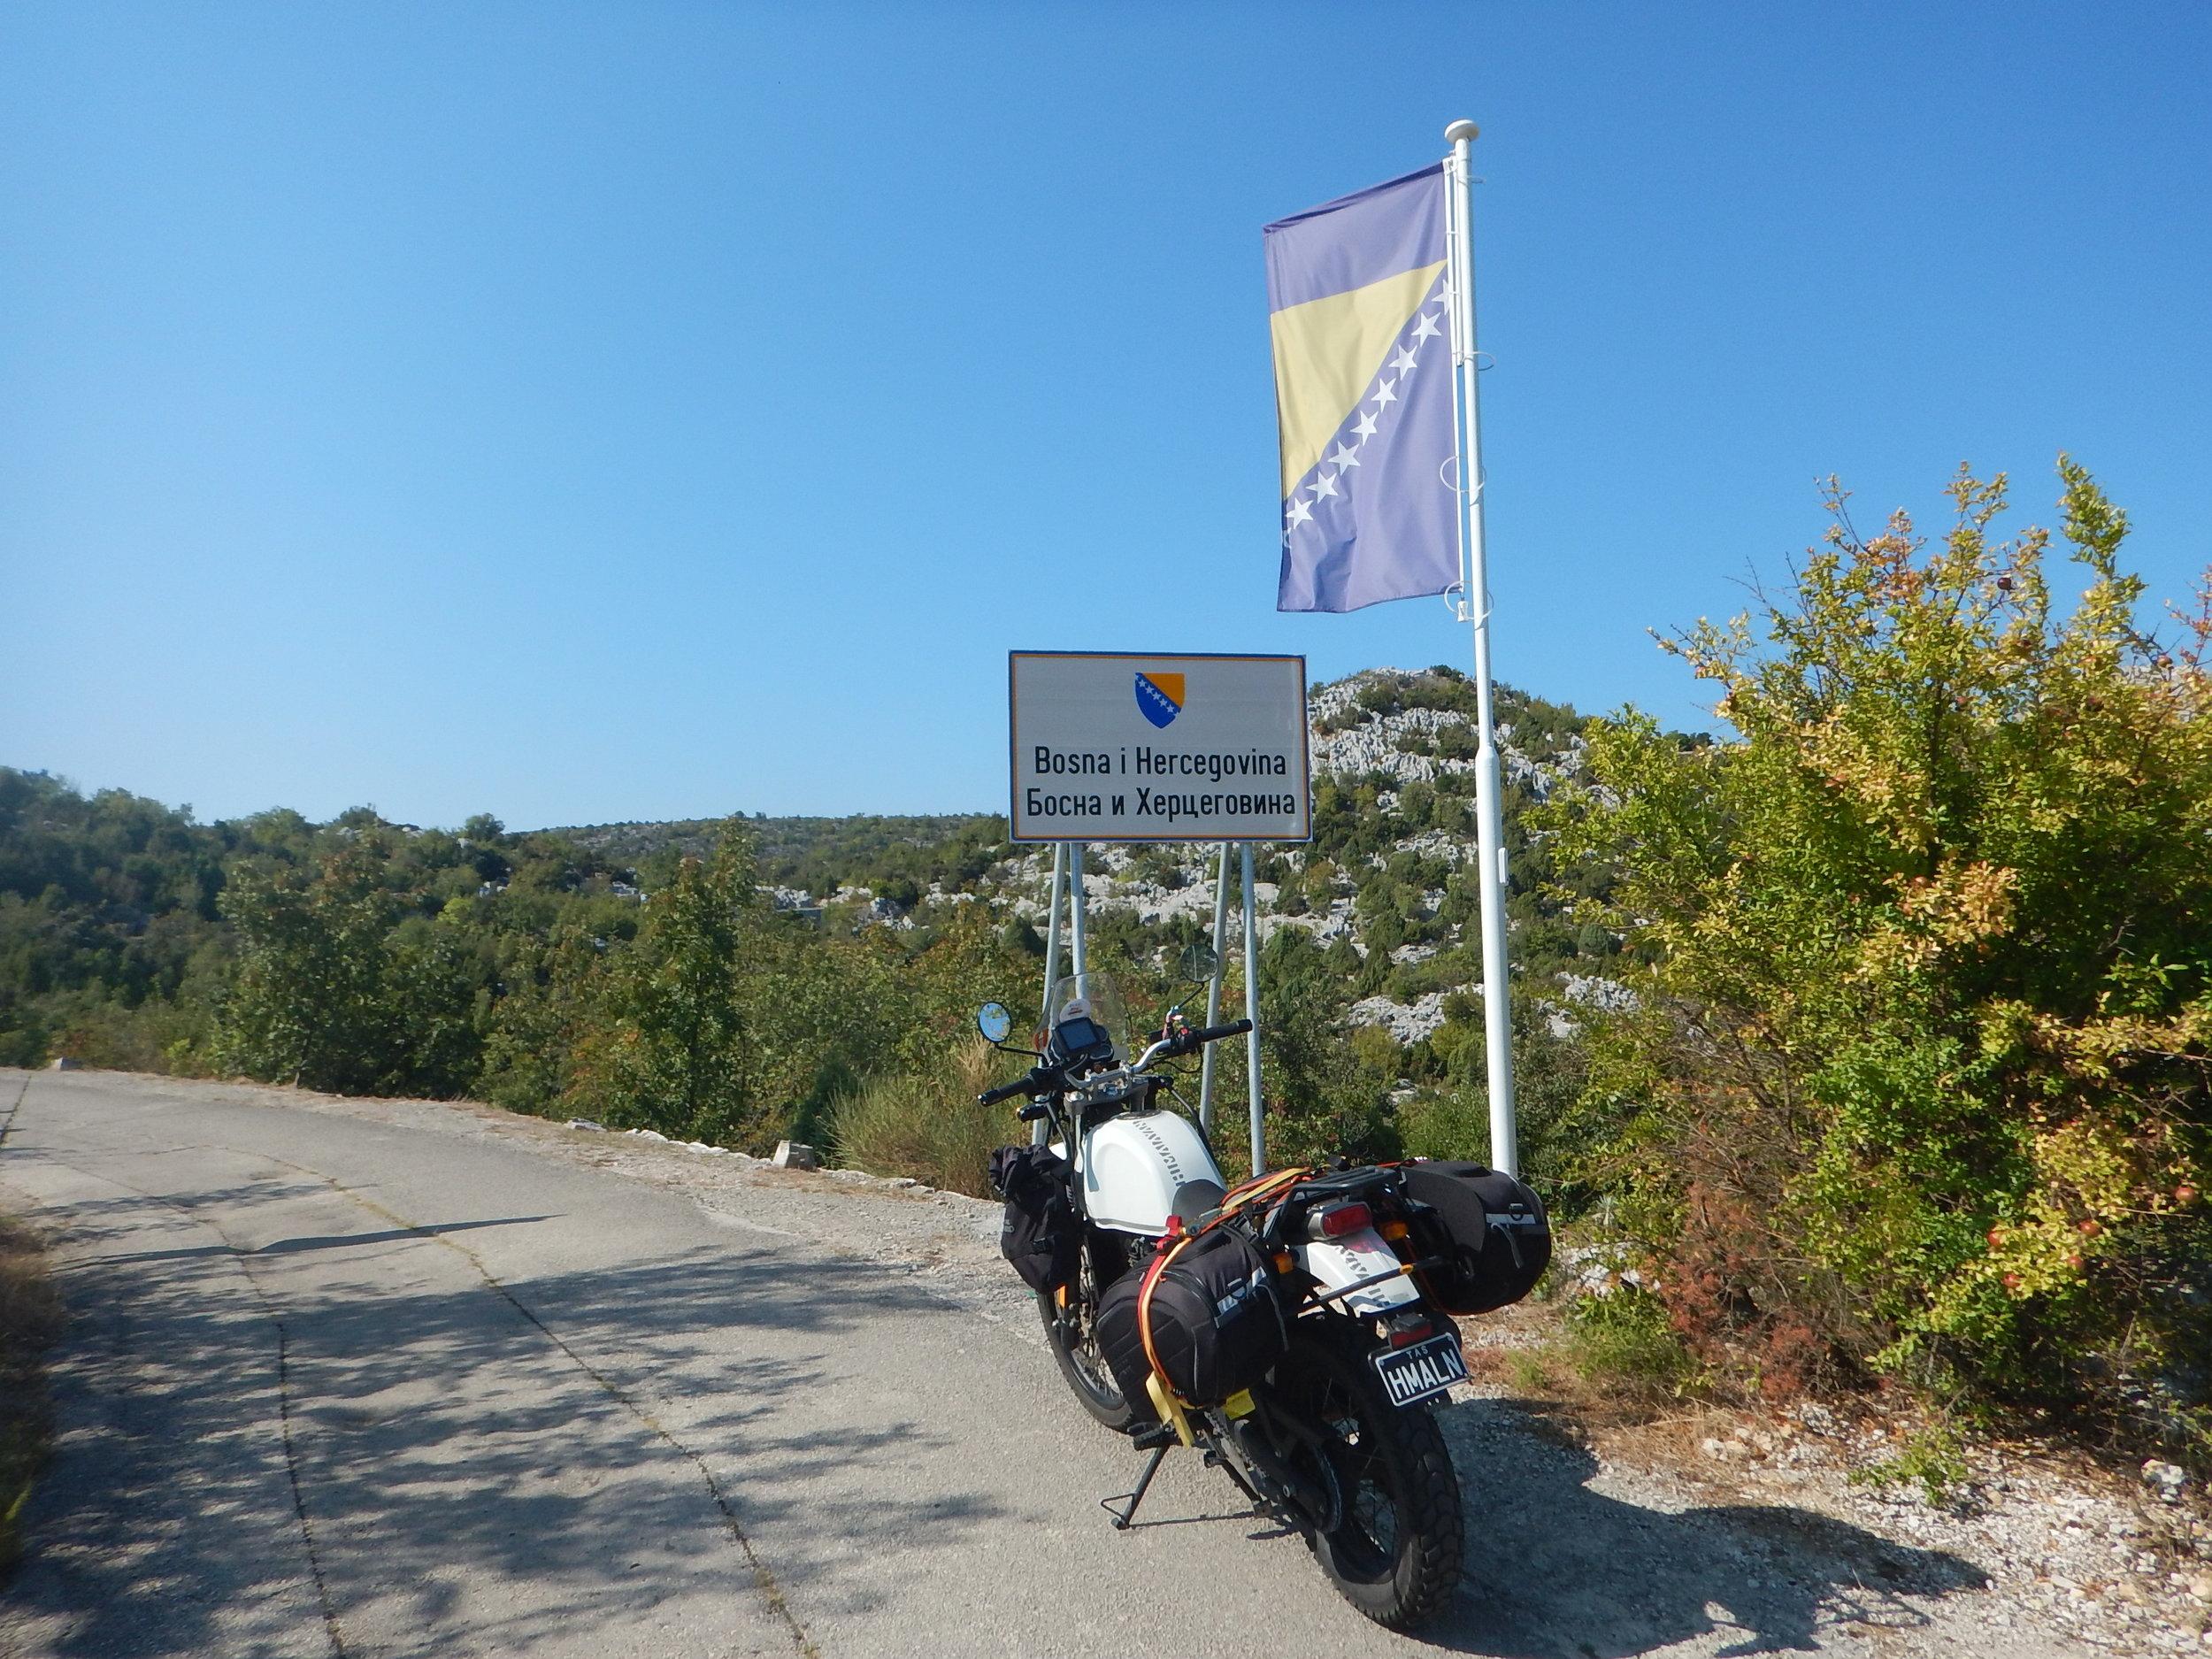 riding along the valley out of Croatia back into Bosnia. No passport check!!